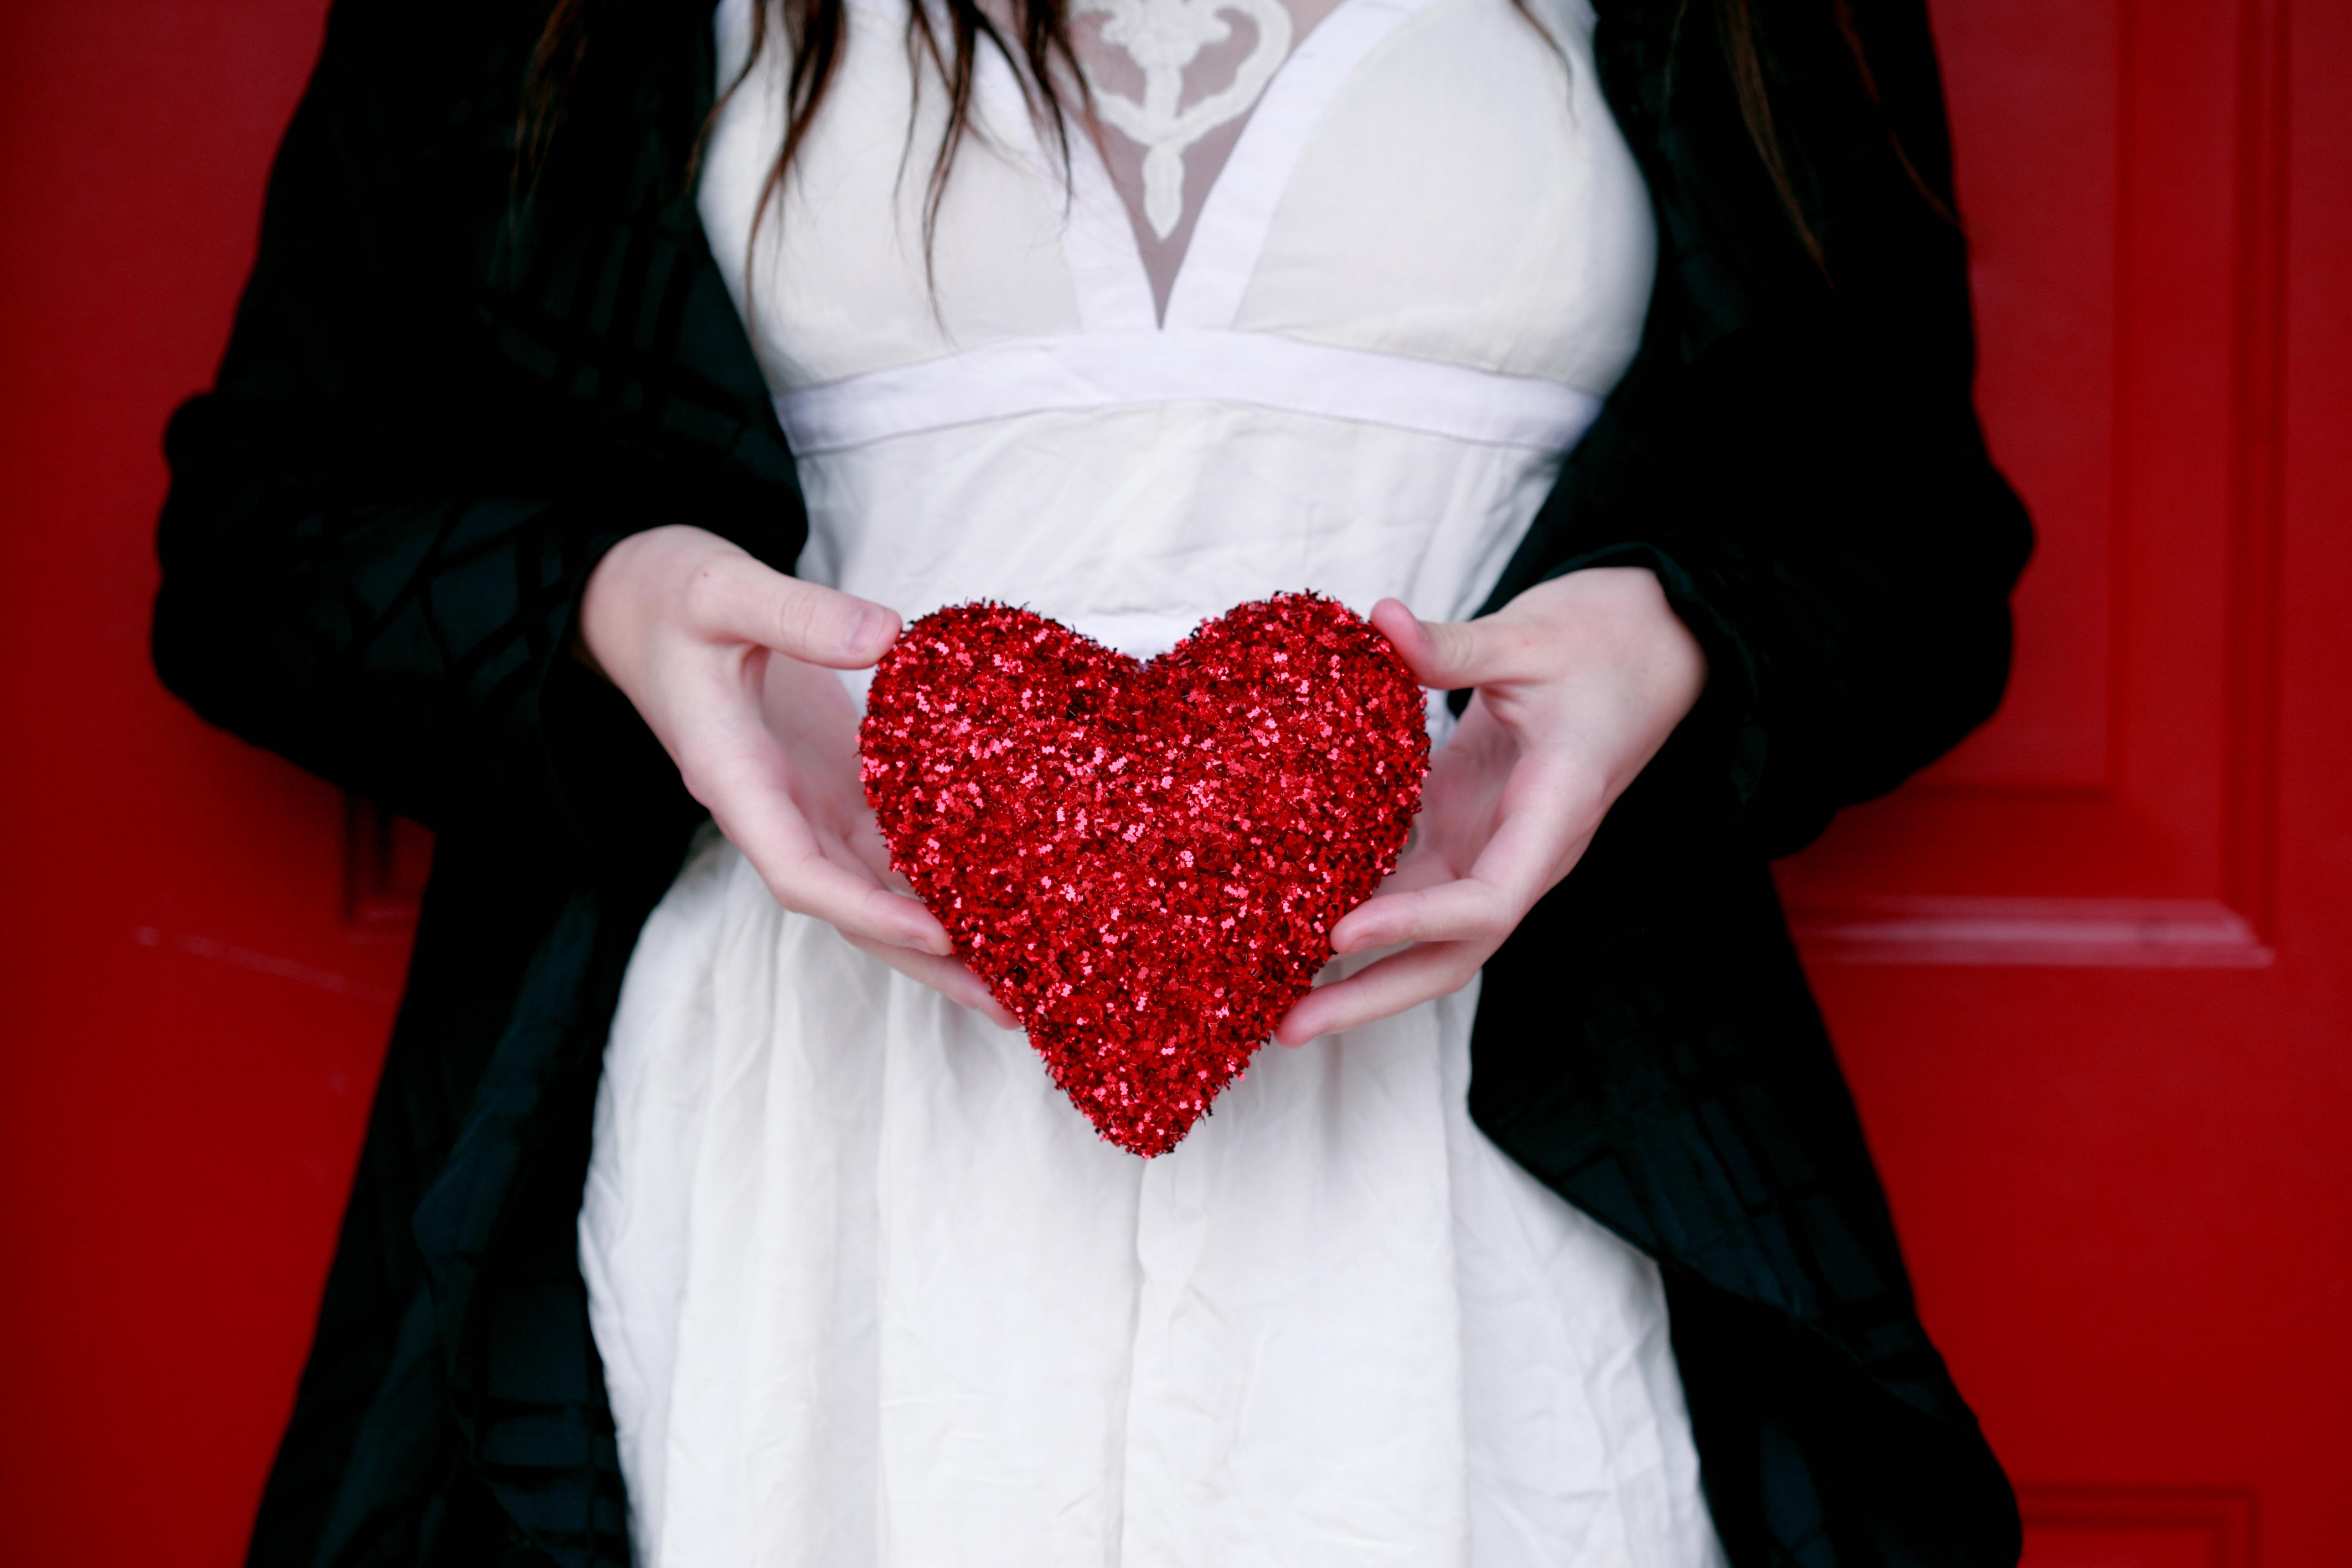 5 steps to a happy Valentine's Day